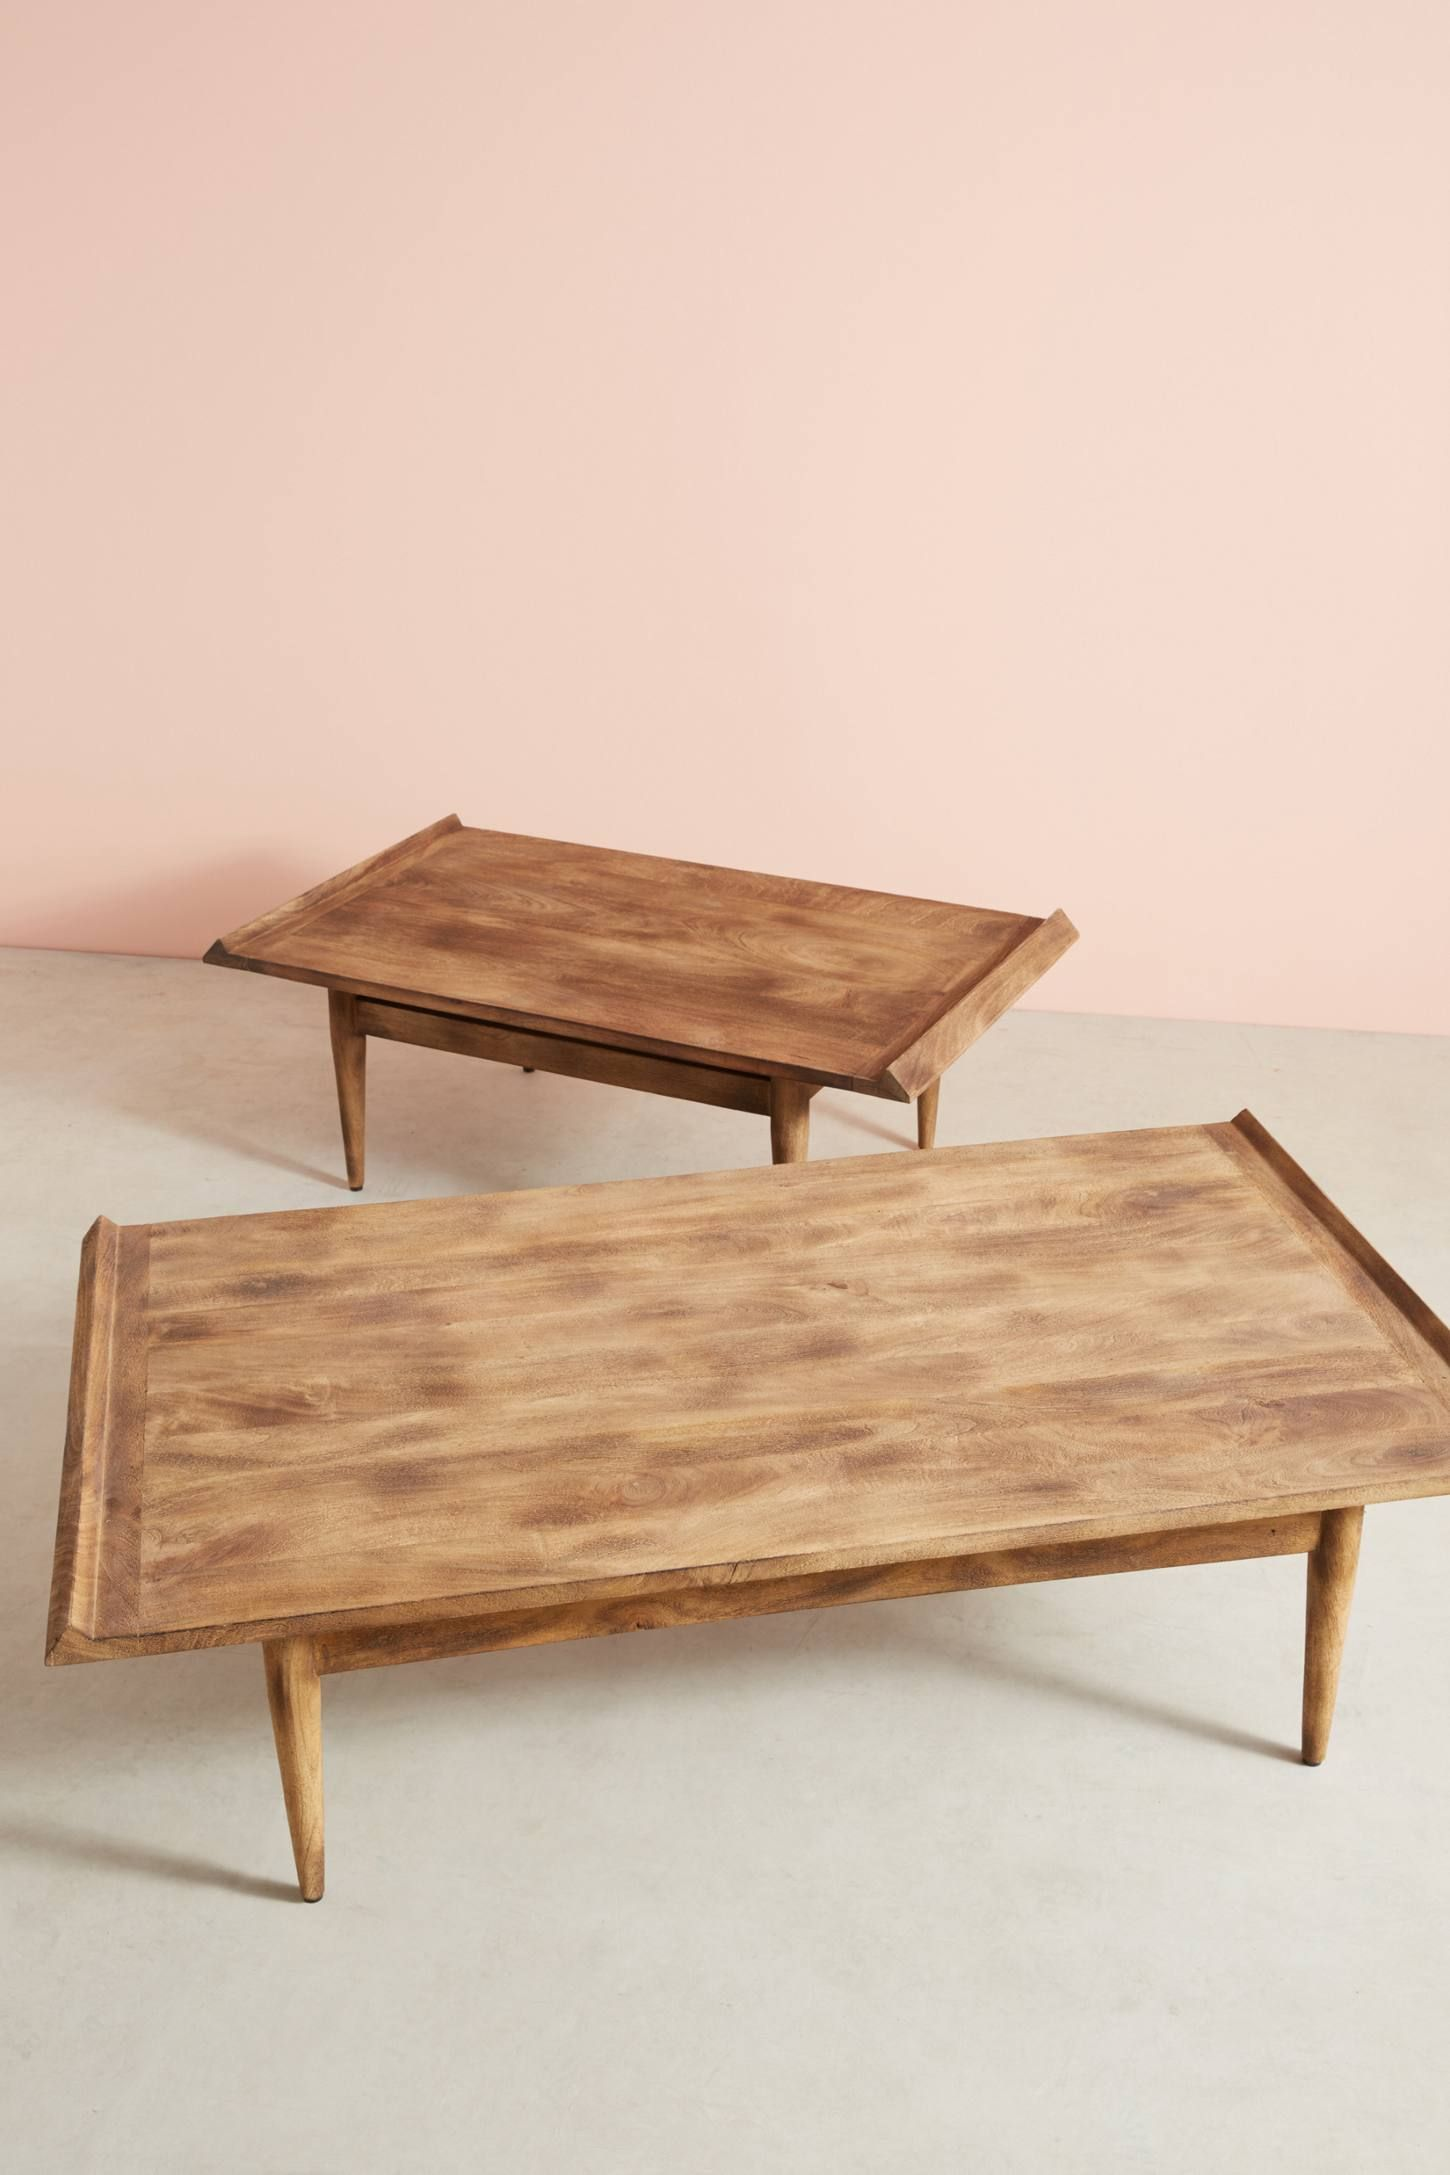 Burnished Wood Coffee Table Victorian Coffee Tables Coffee Table Furniture Coffee Table